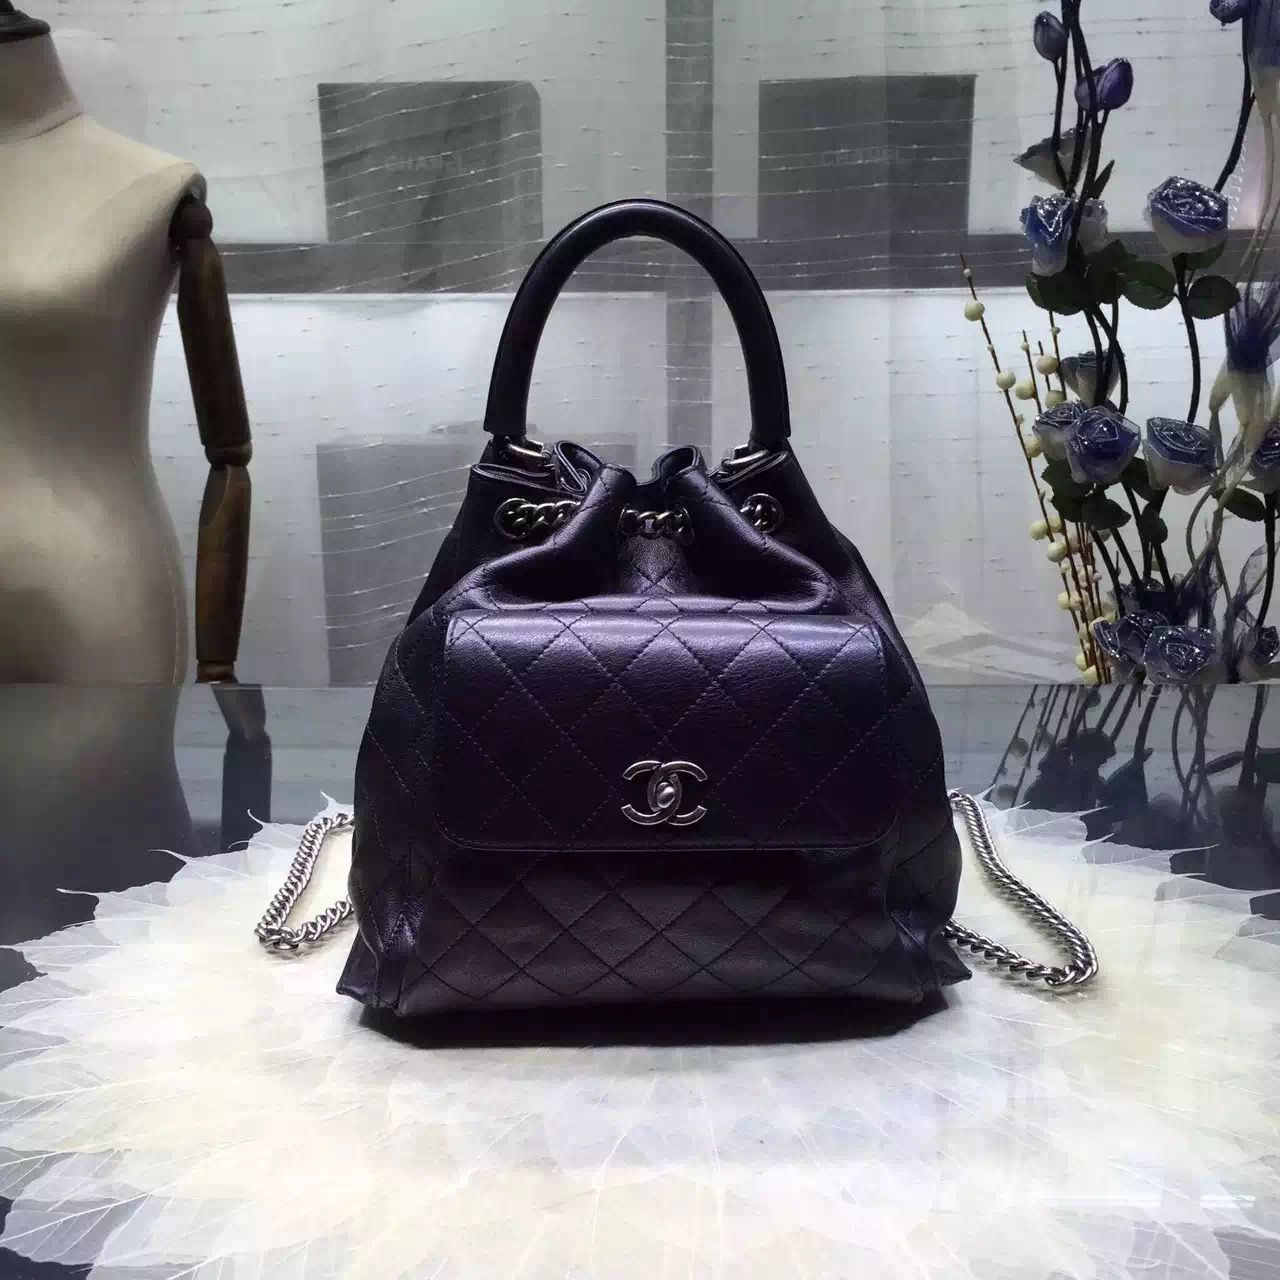 d6b50a0e40c4 Chanel A93881 Calfskin Drawstring Handbag Pre-SS 2016